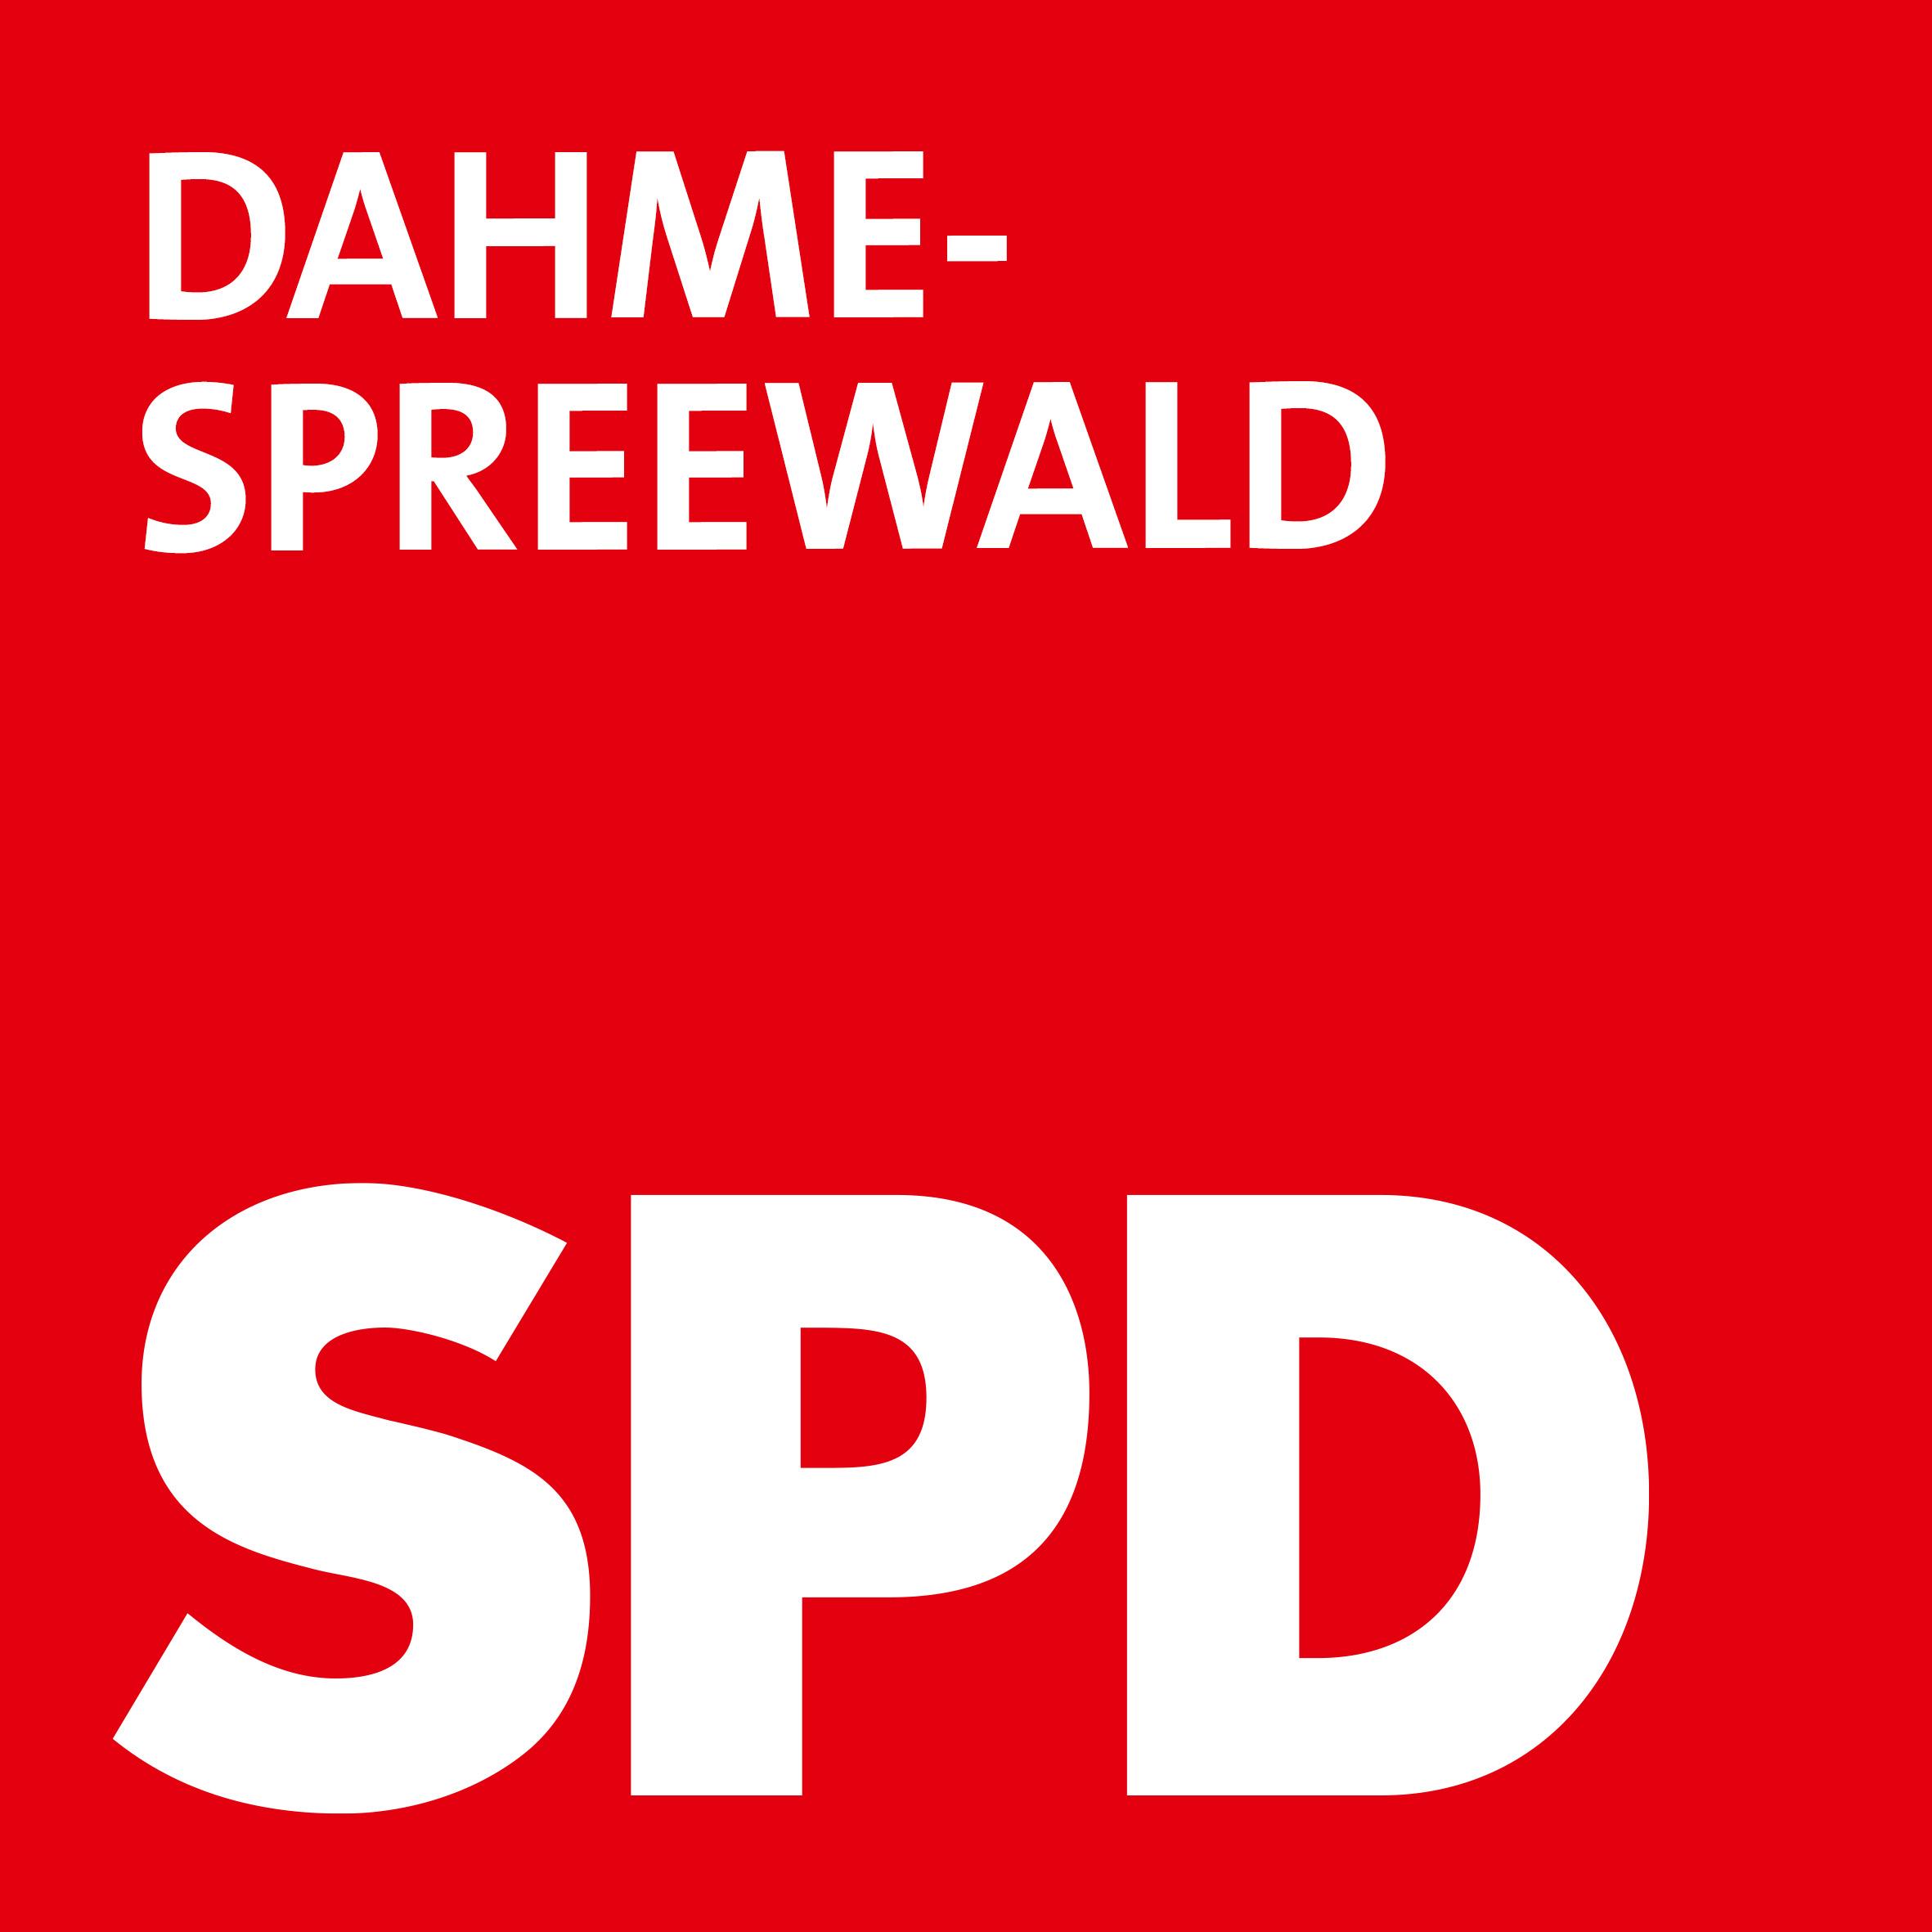 SPD Dahme-Spreewald